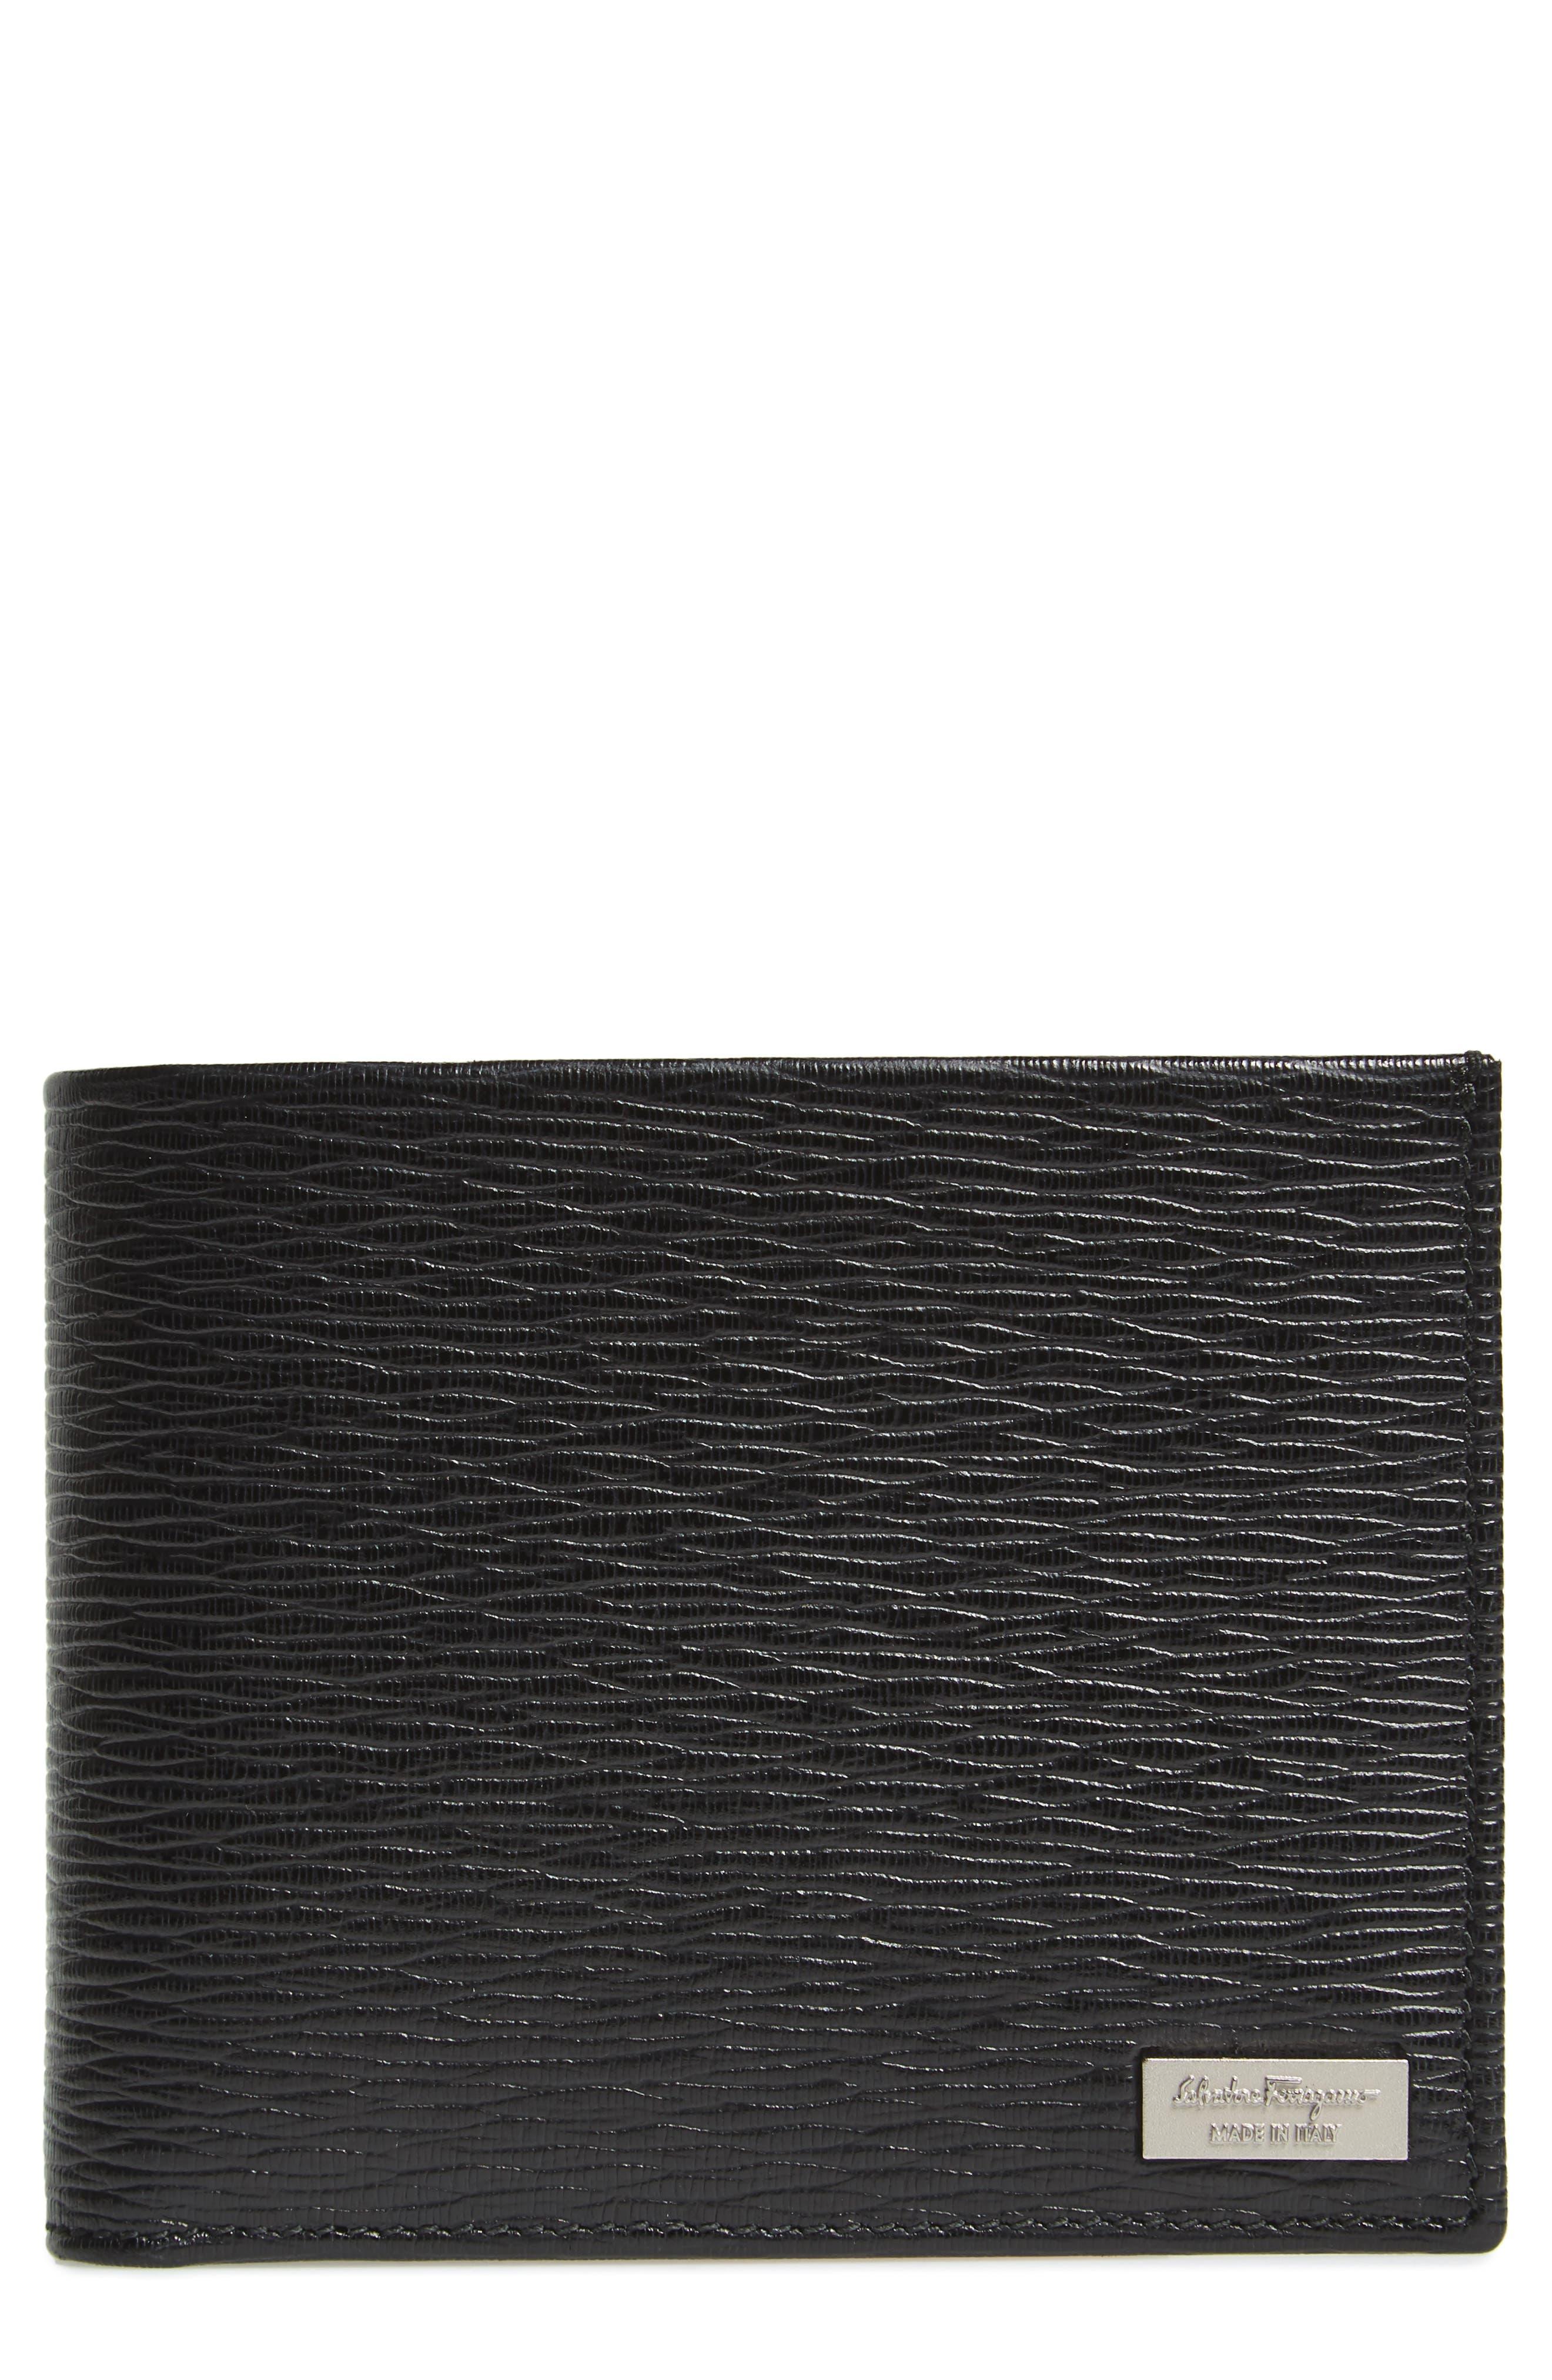 Revival Leather Wallet,                             Main thumbnail 1, color,                             009